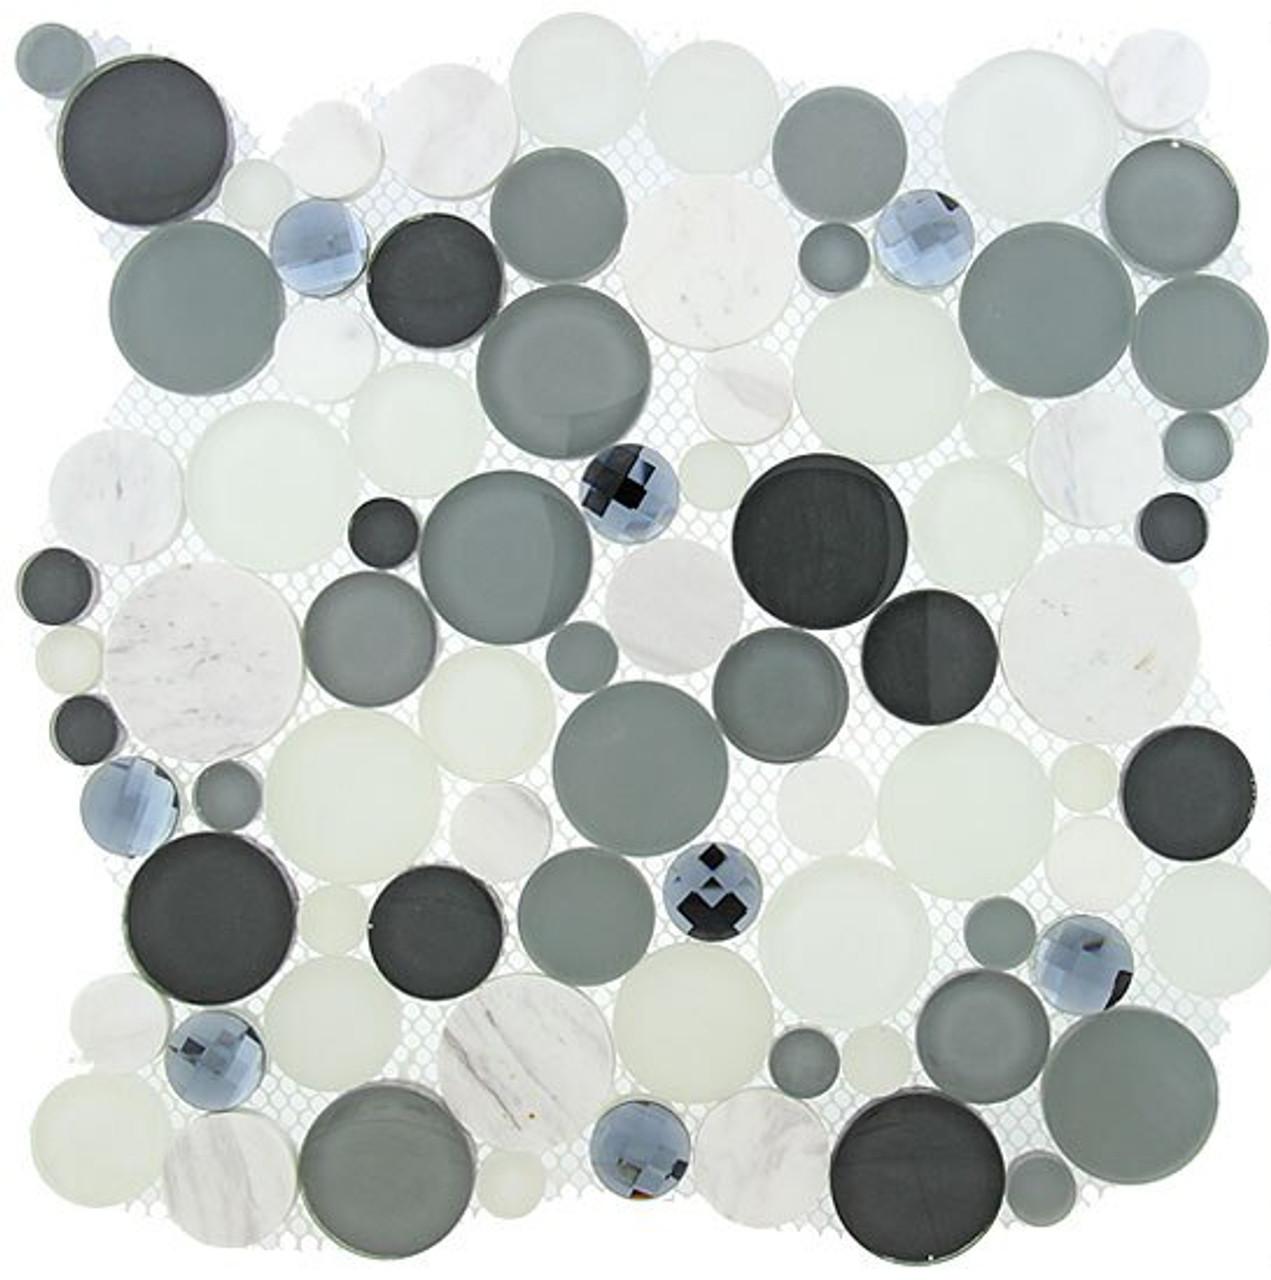 Bella Glass Tiles Symphony Bubble Series Grey Fizz